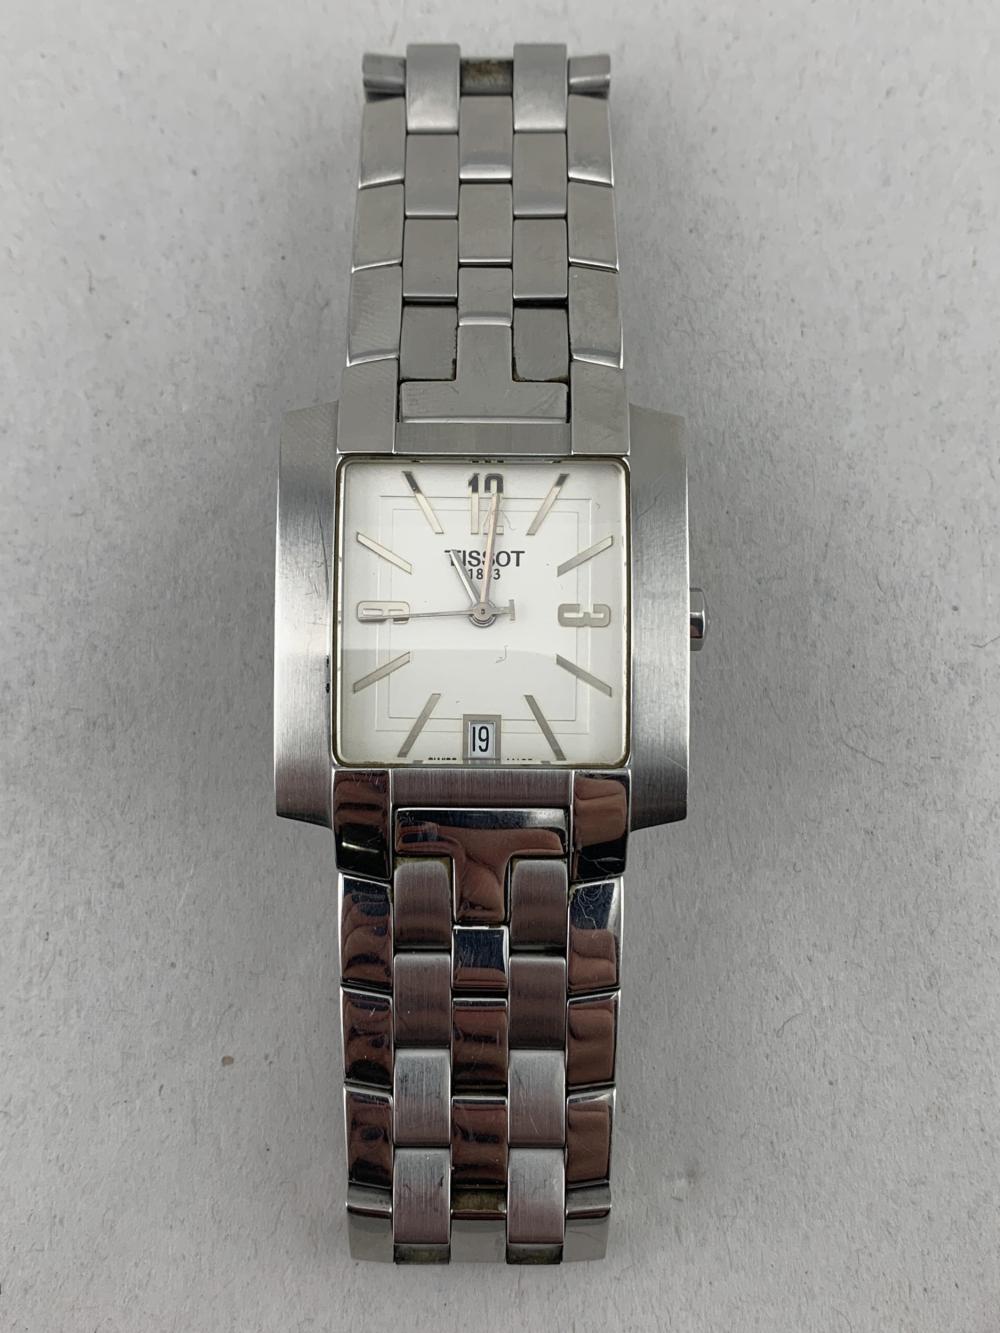 Tissot 1853 Square L860/960 Men's Wrist Watch